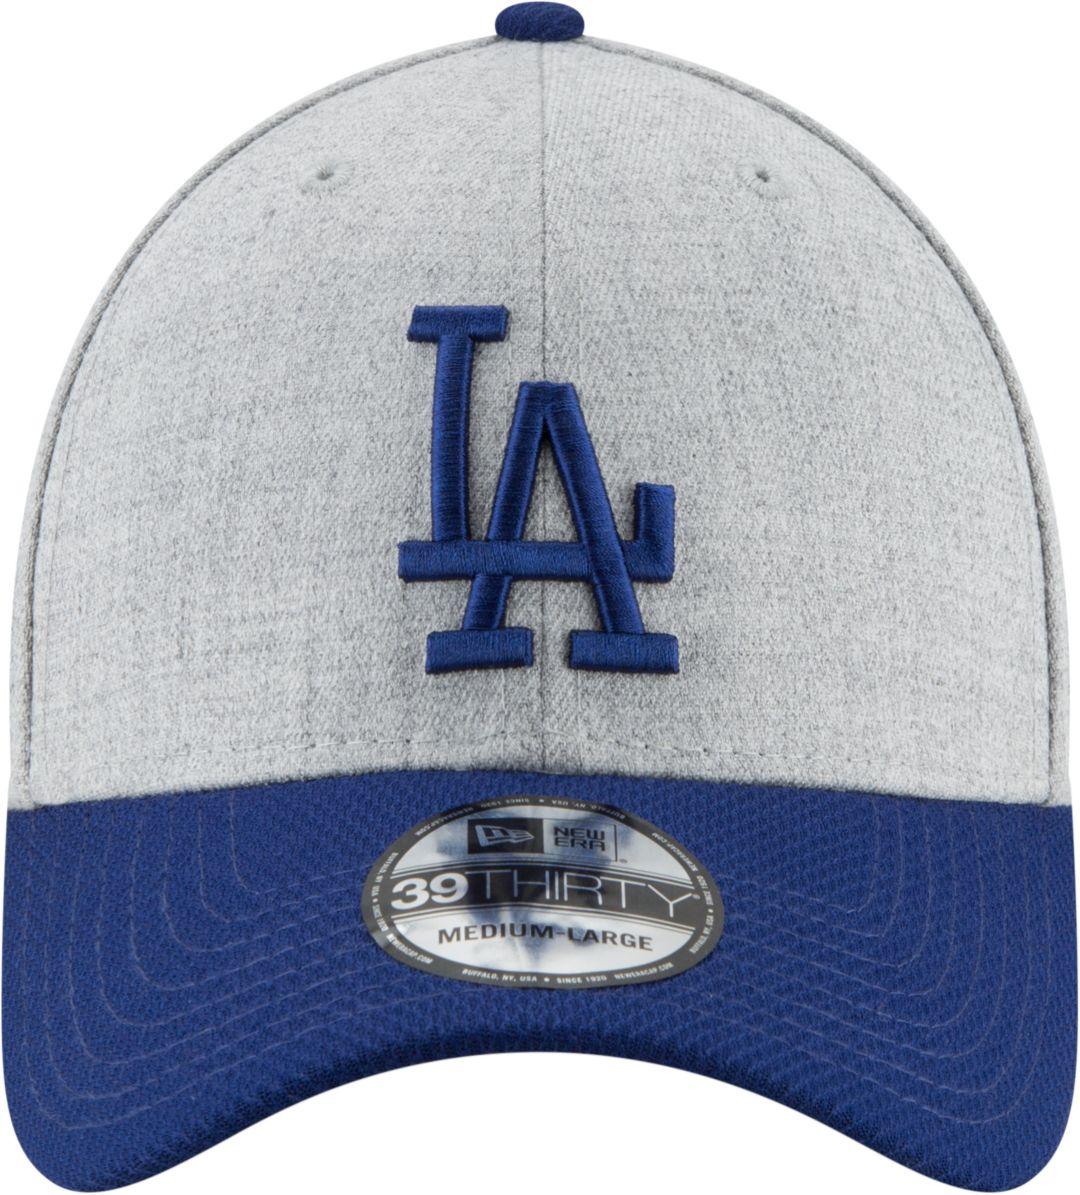 7904e6864daab5 New Era Men's Los Angeles Dodgers 39Thirty Change Up Redux Grey Stretch Fit  Hat